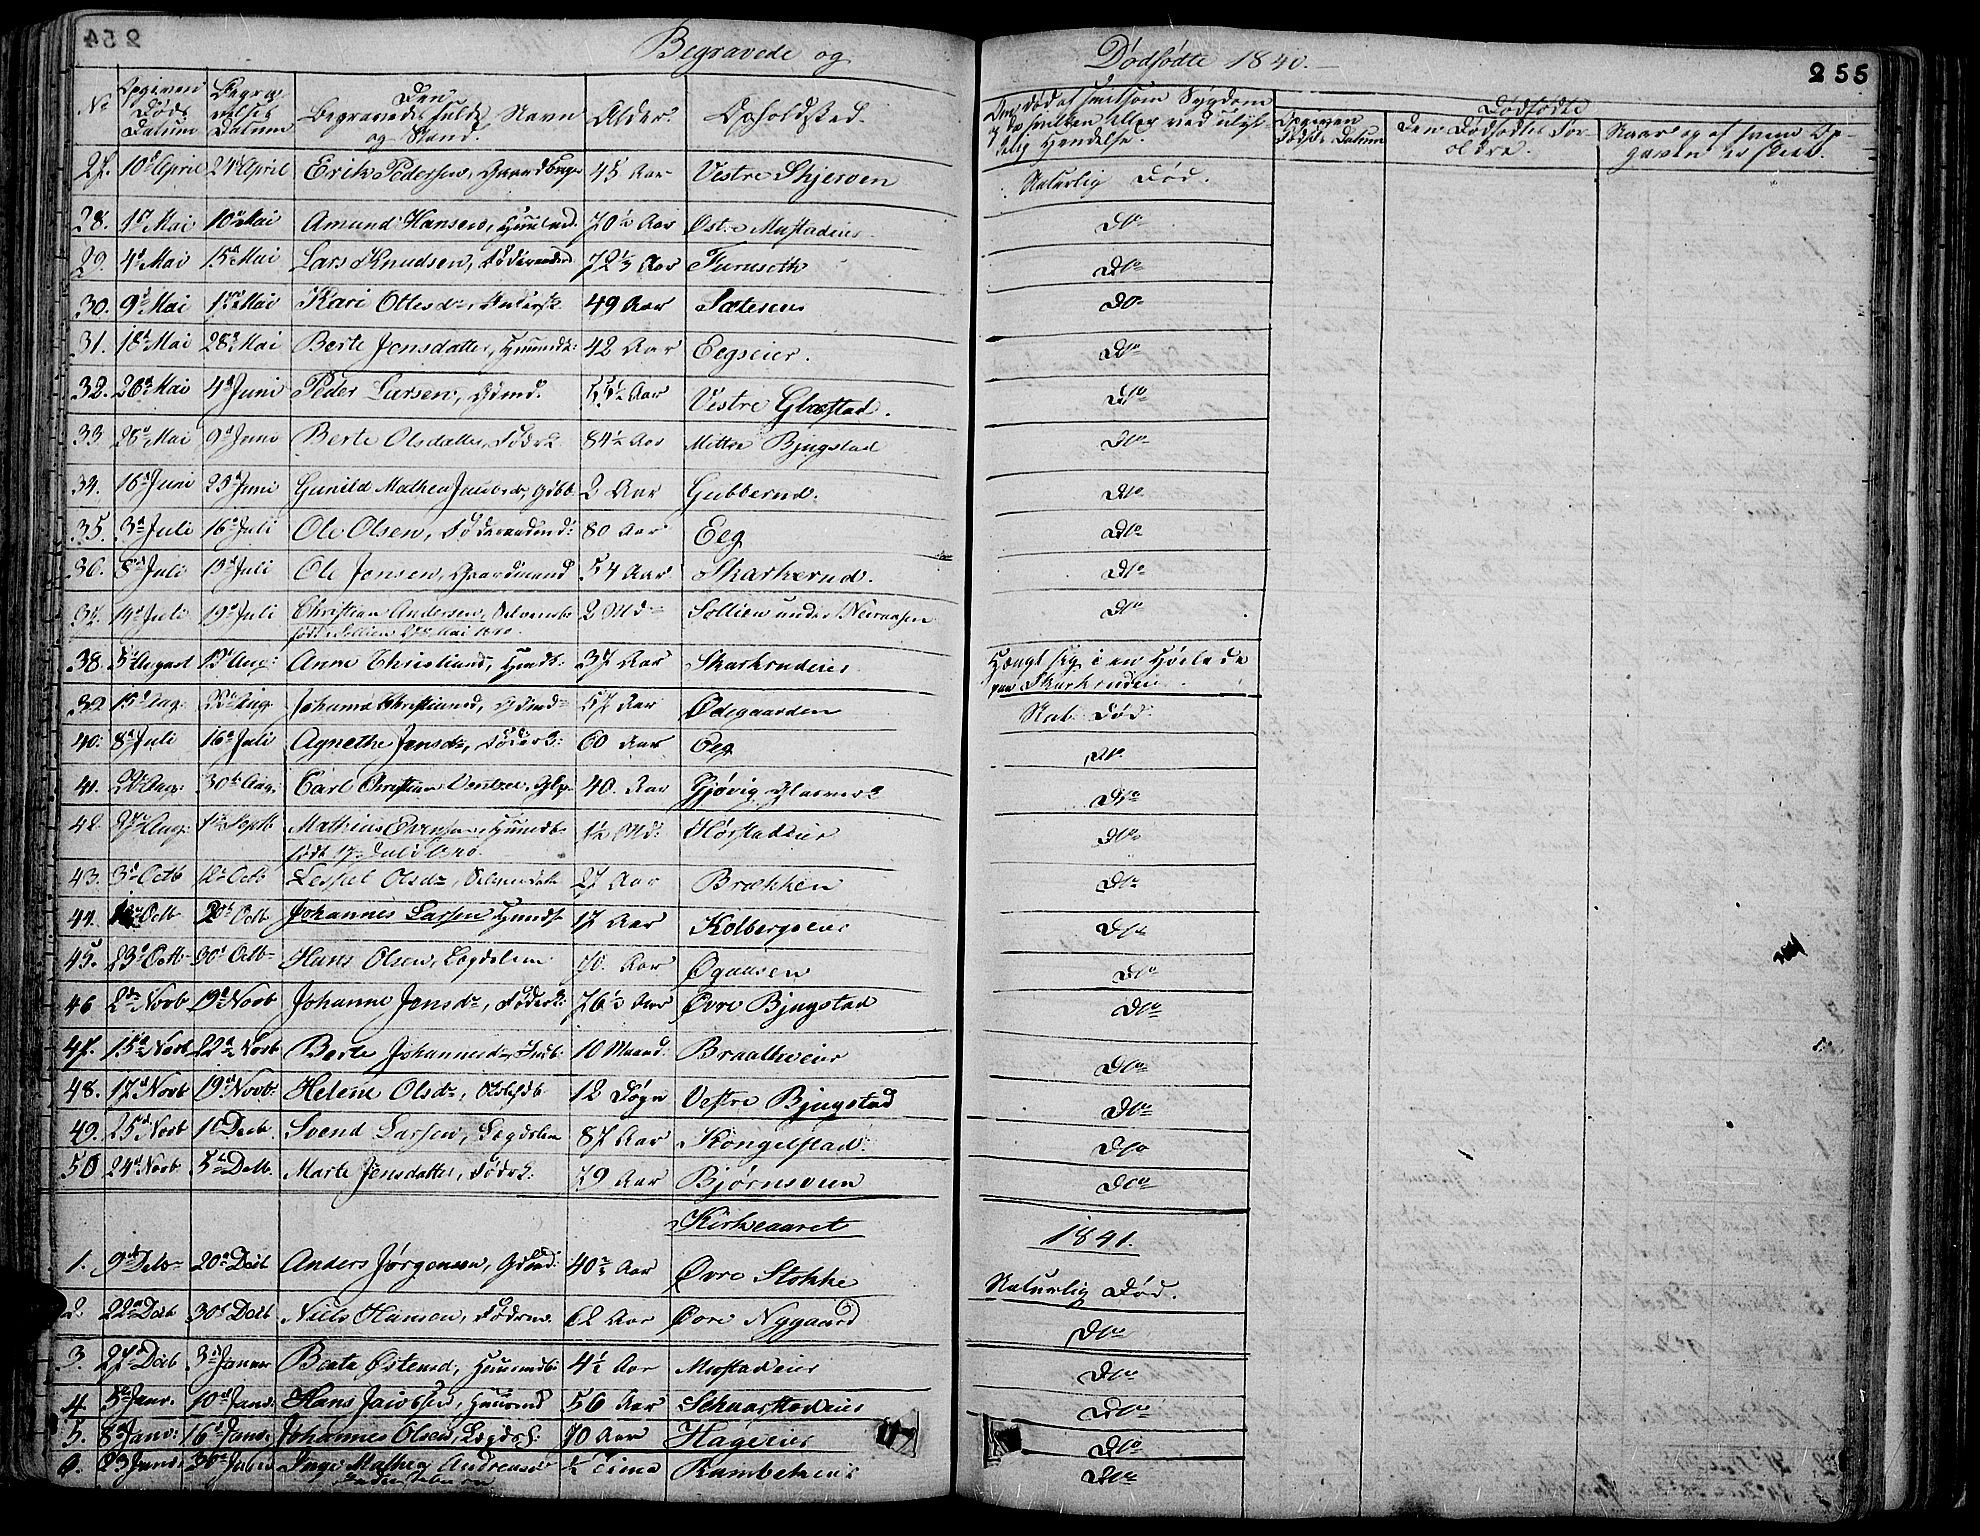 SAH, Vardal prestekontor, H/Ha/Hab/L0004: Klokkerbok nr. 4, 1831-1853, s. 255